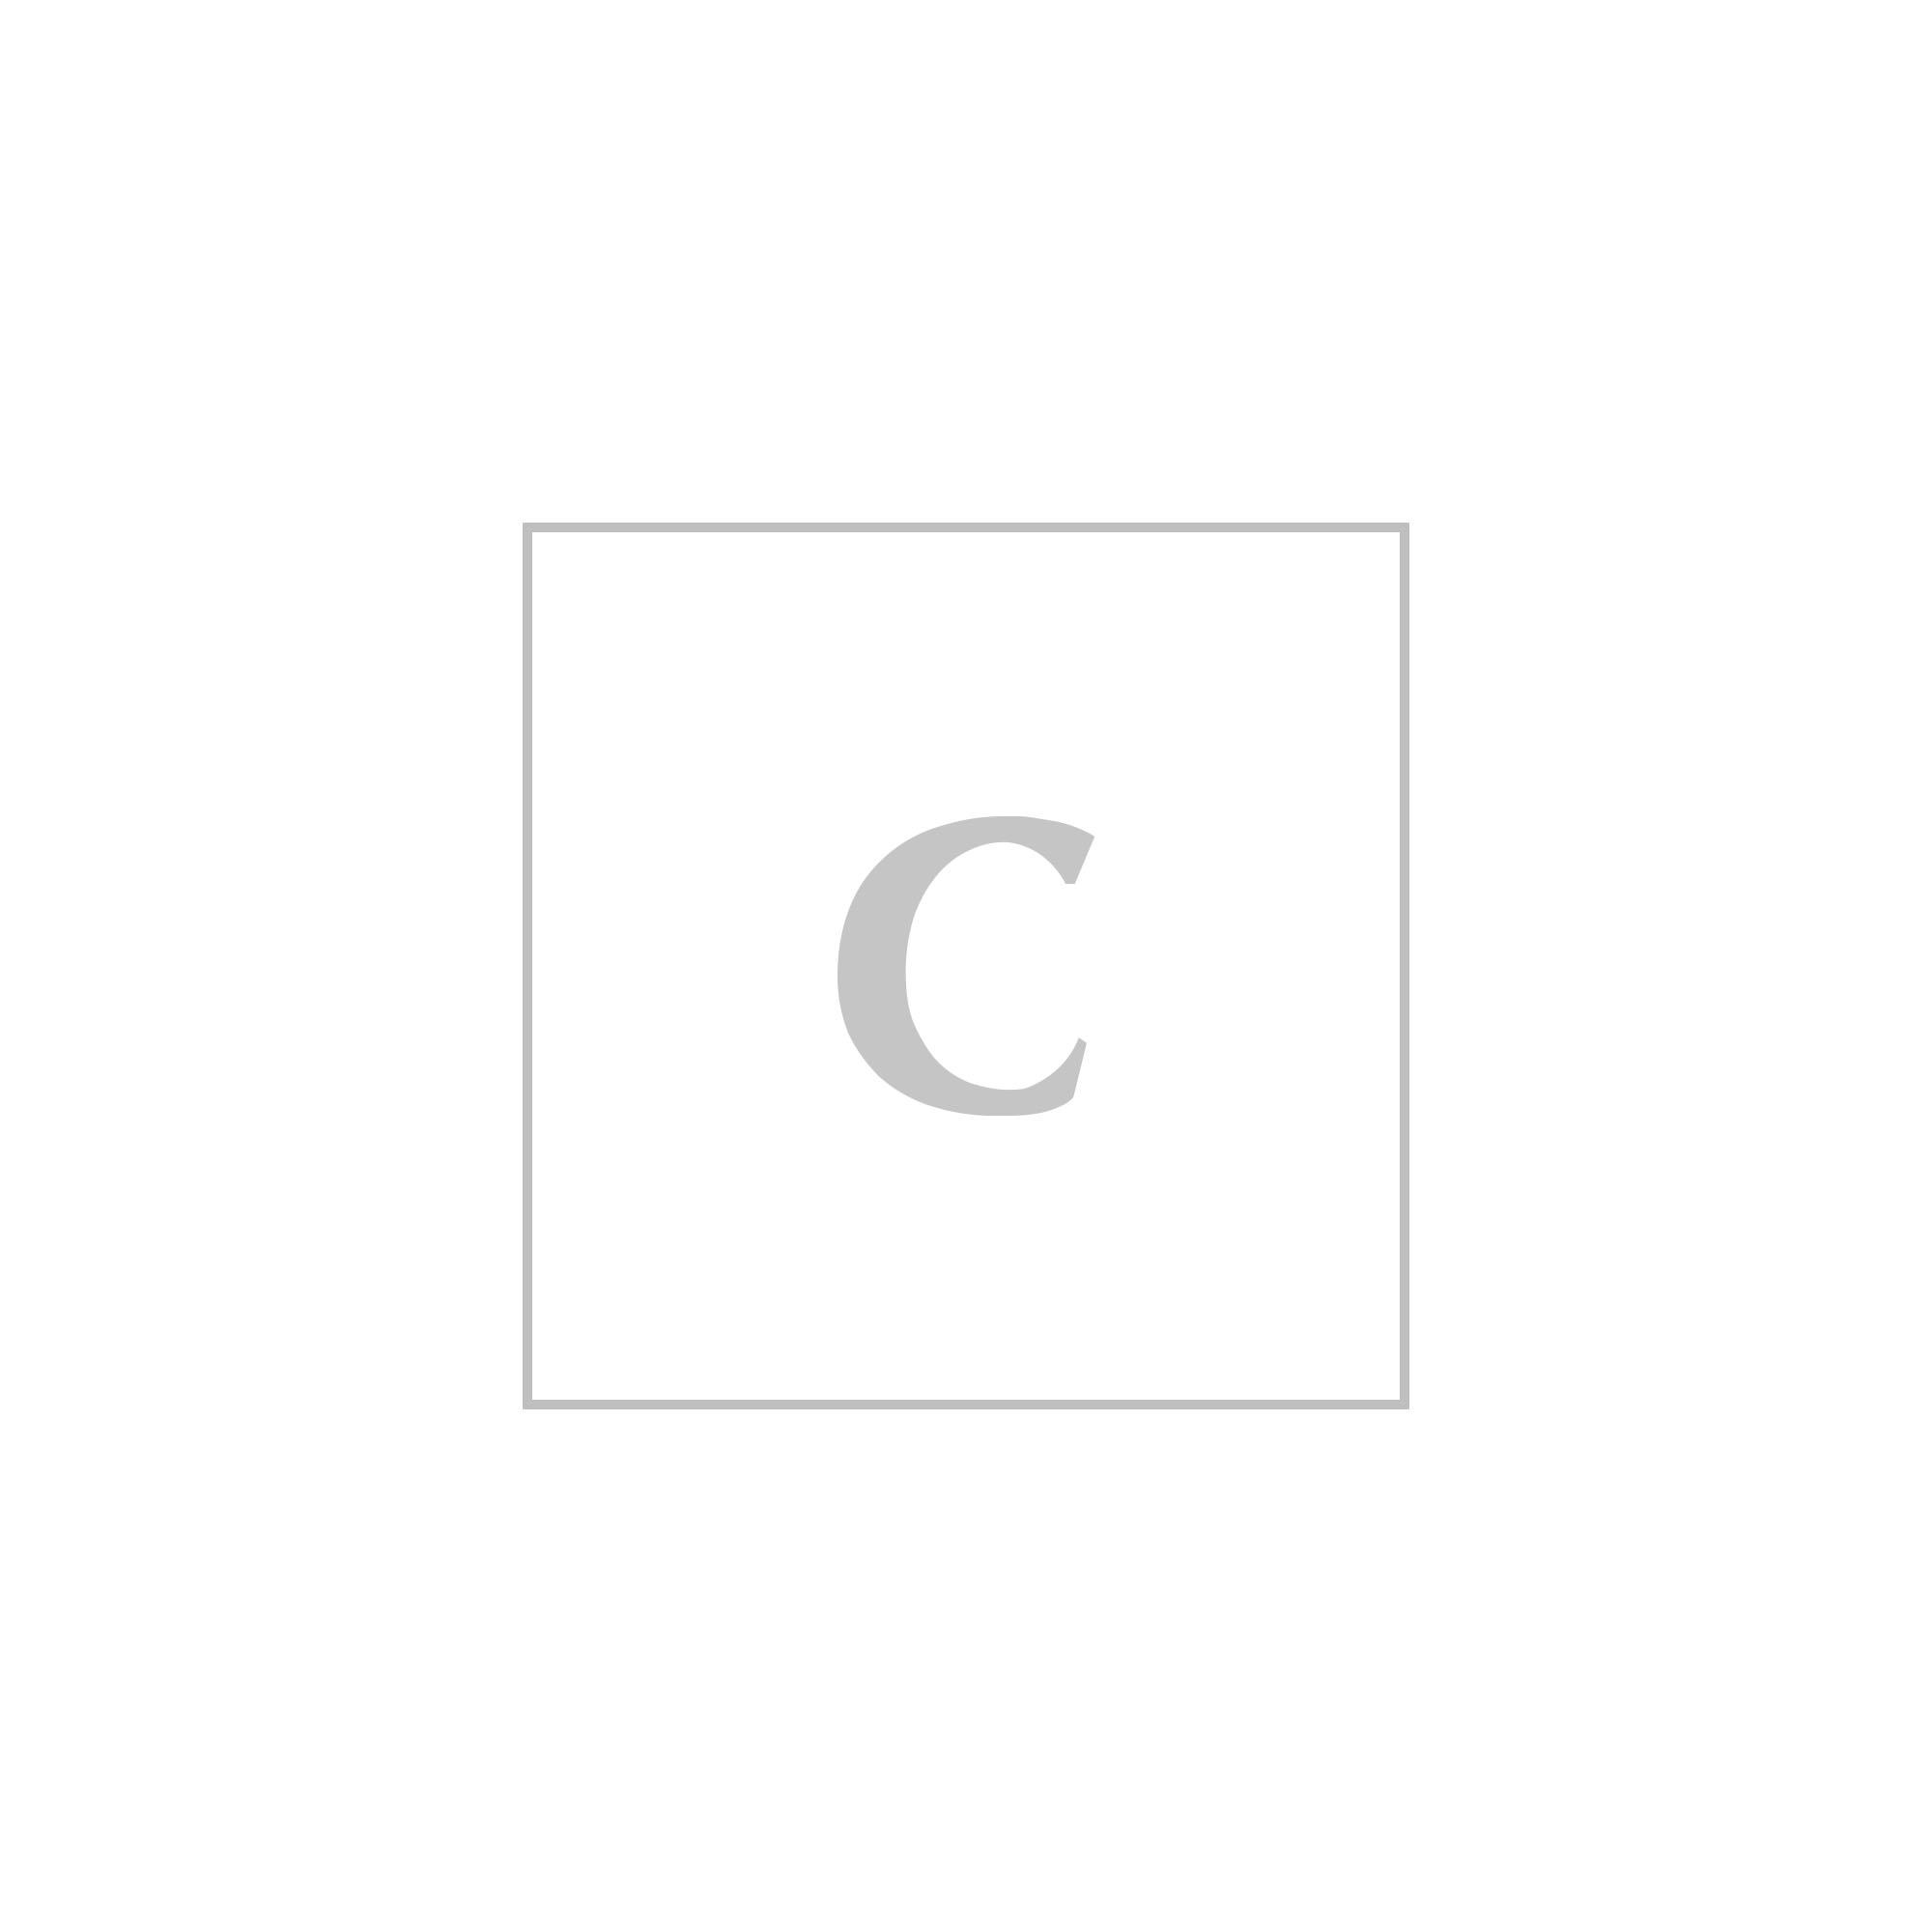 Dolce & gabbana slingback broccato stampa foul